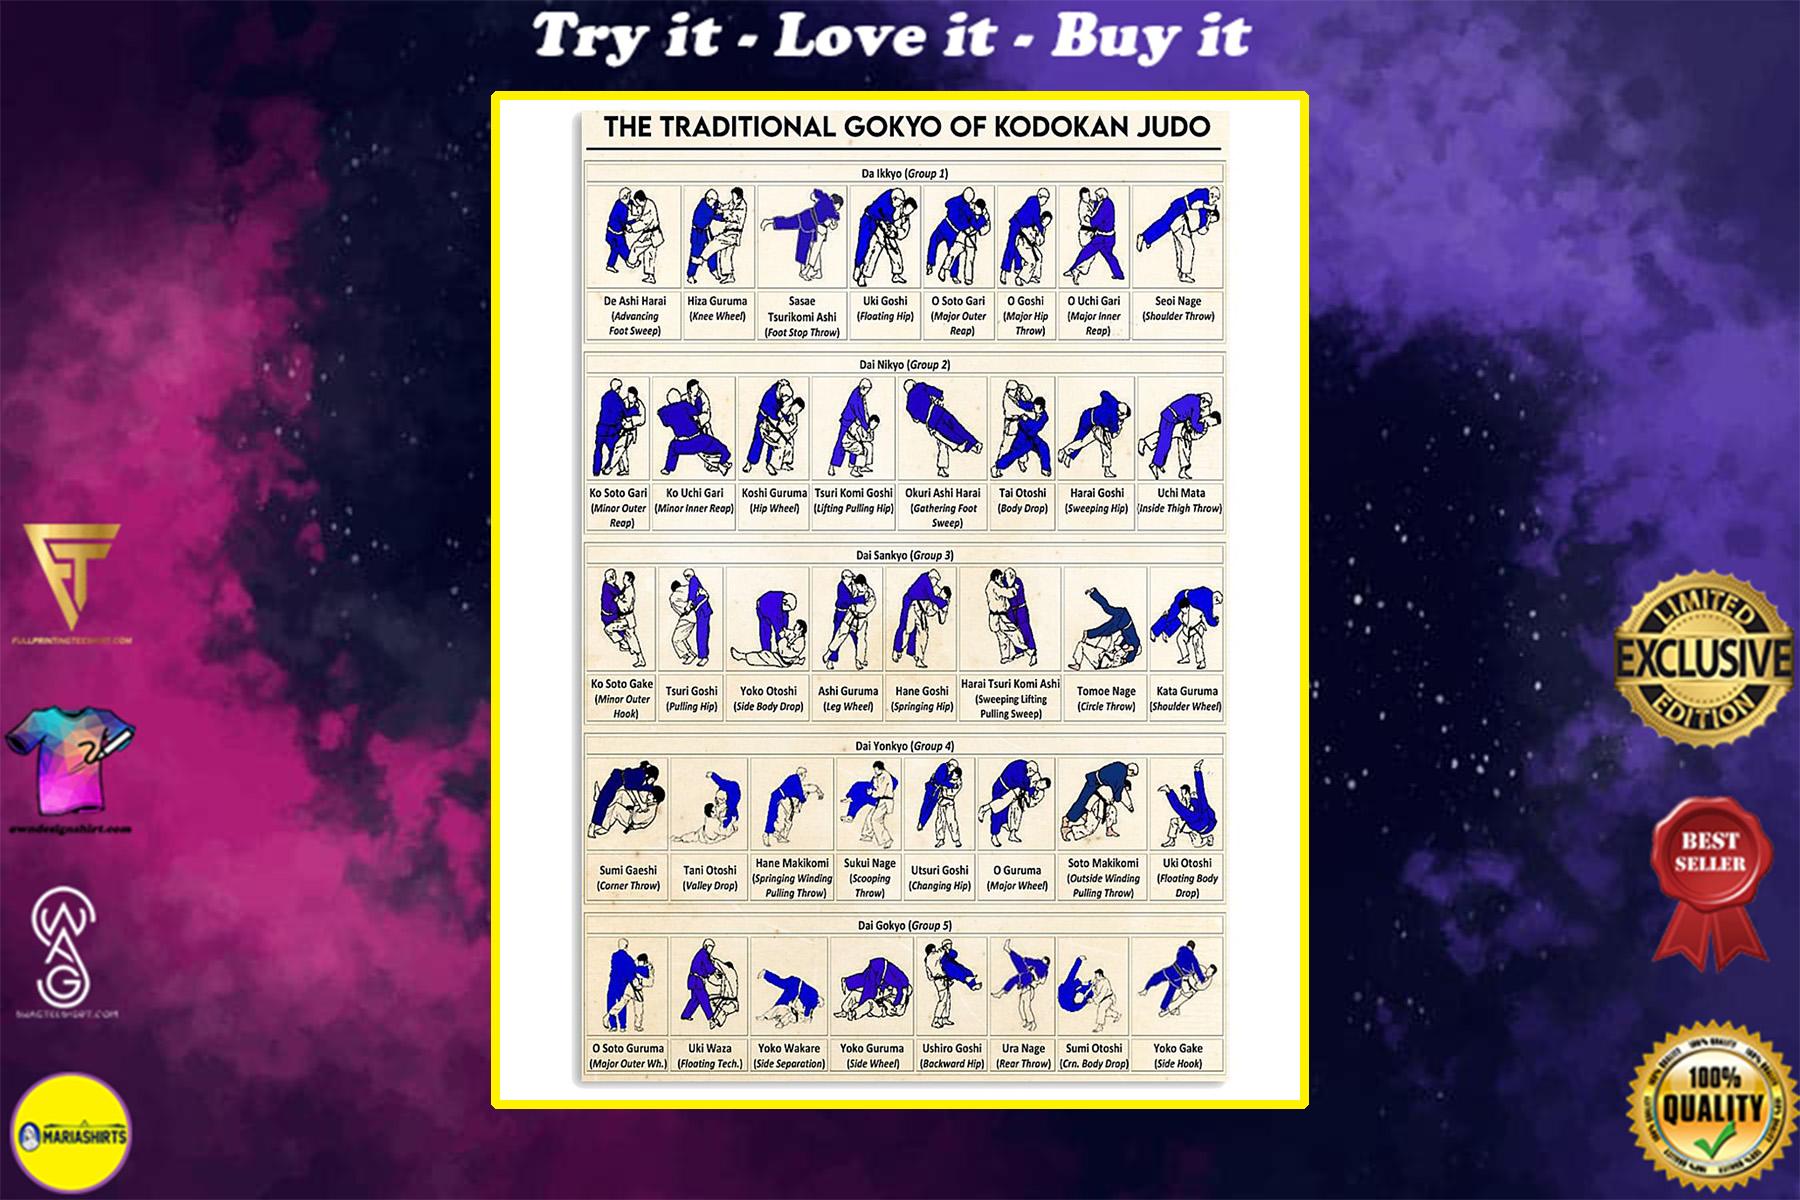 the traditional gokyo of kodokan judo poster